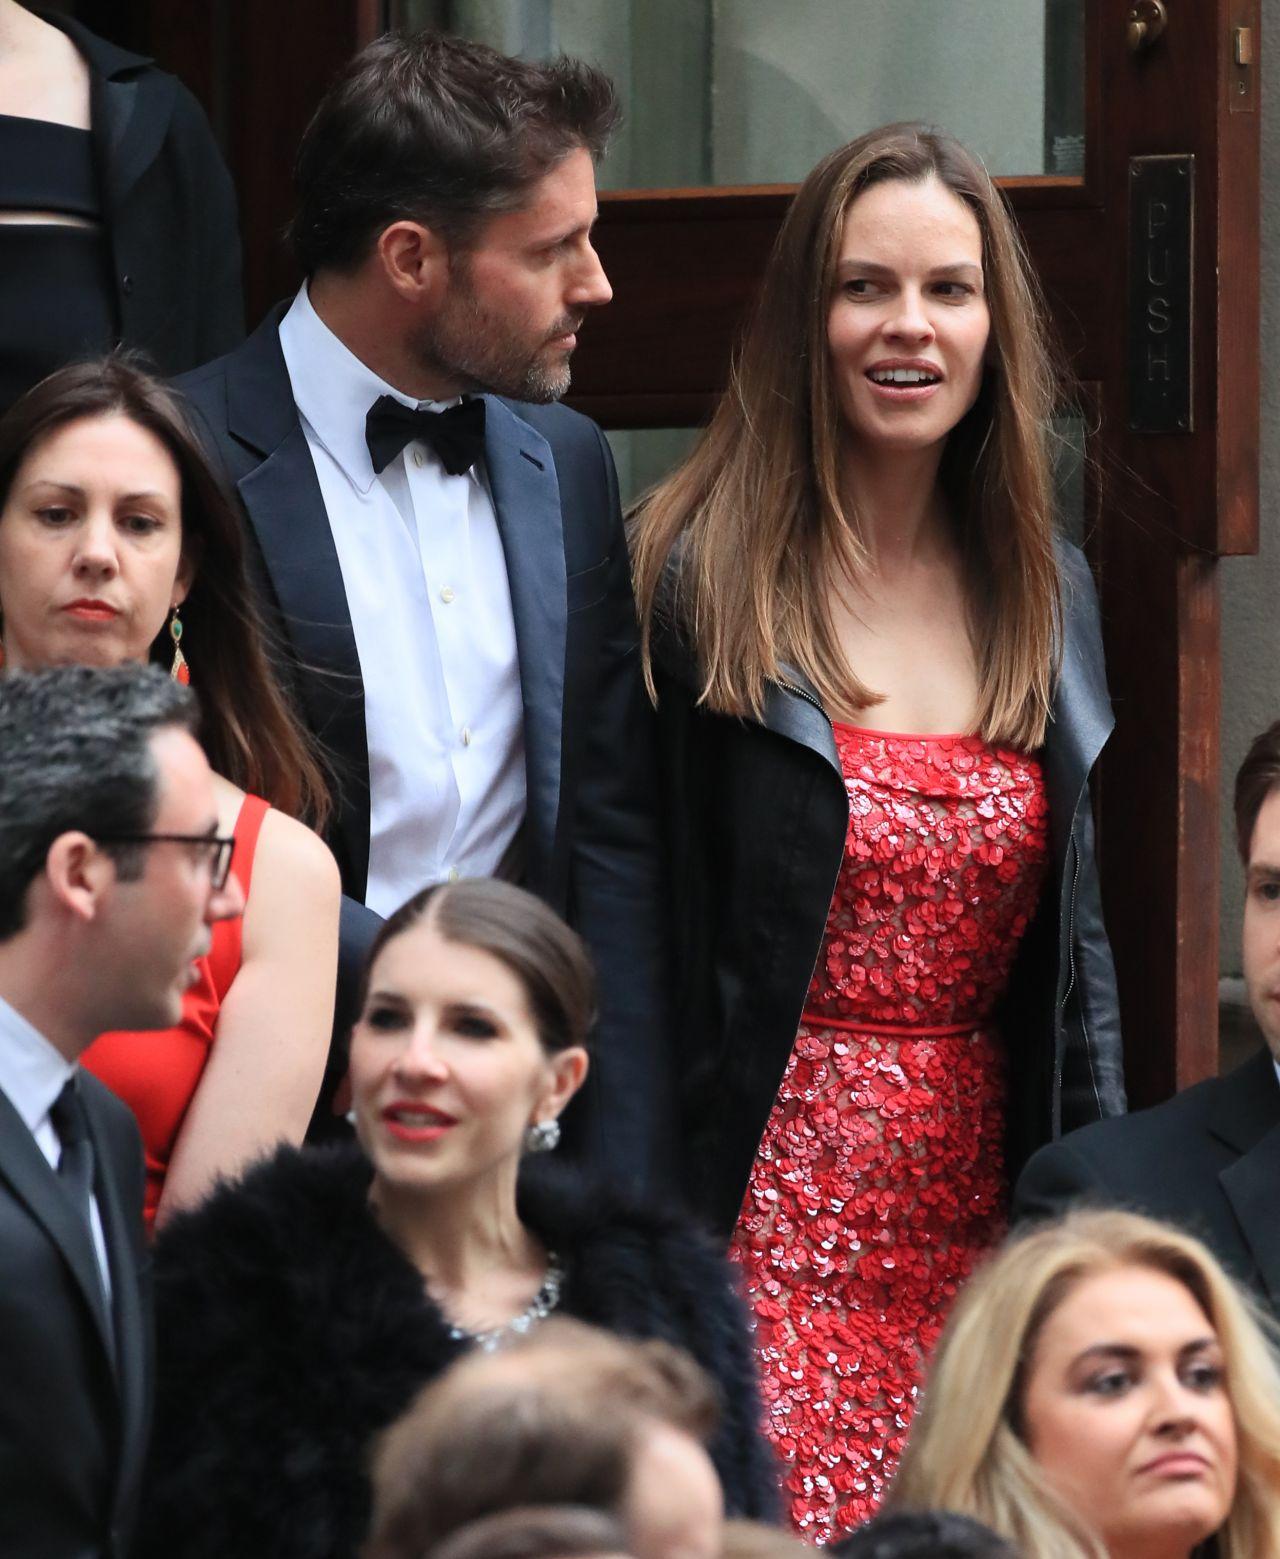 Emmy Rossum Wedding: Hilary Swank At Emmy Rossum's Wedding In New York City 05